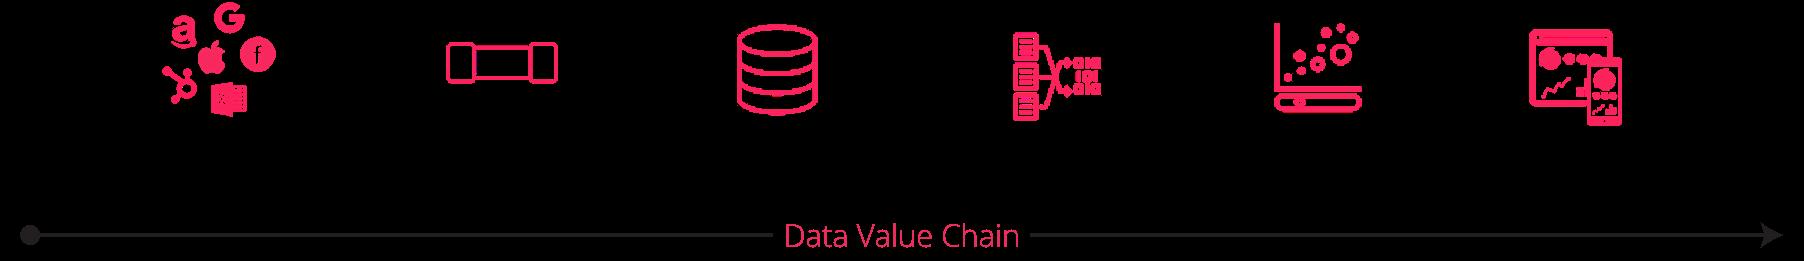 Data Value Chain Diagram